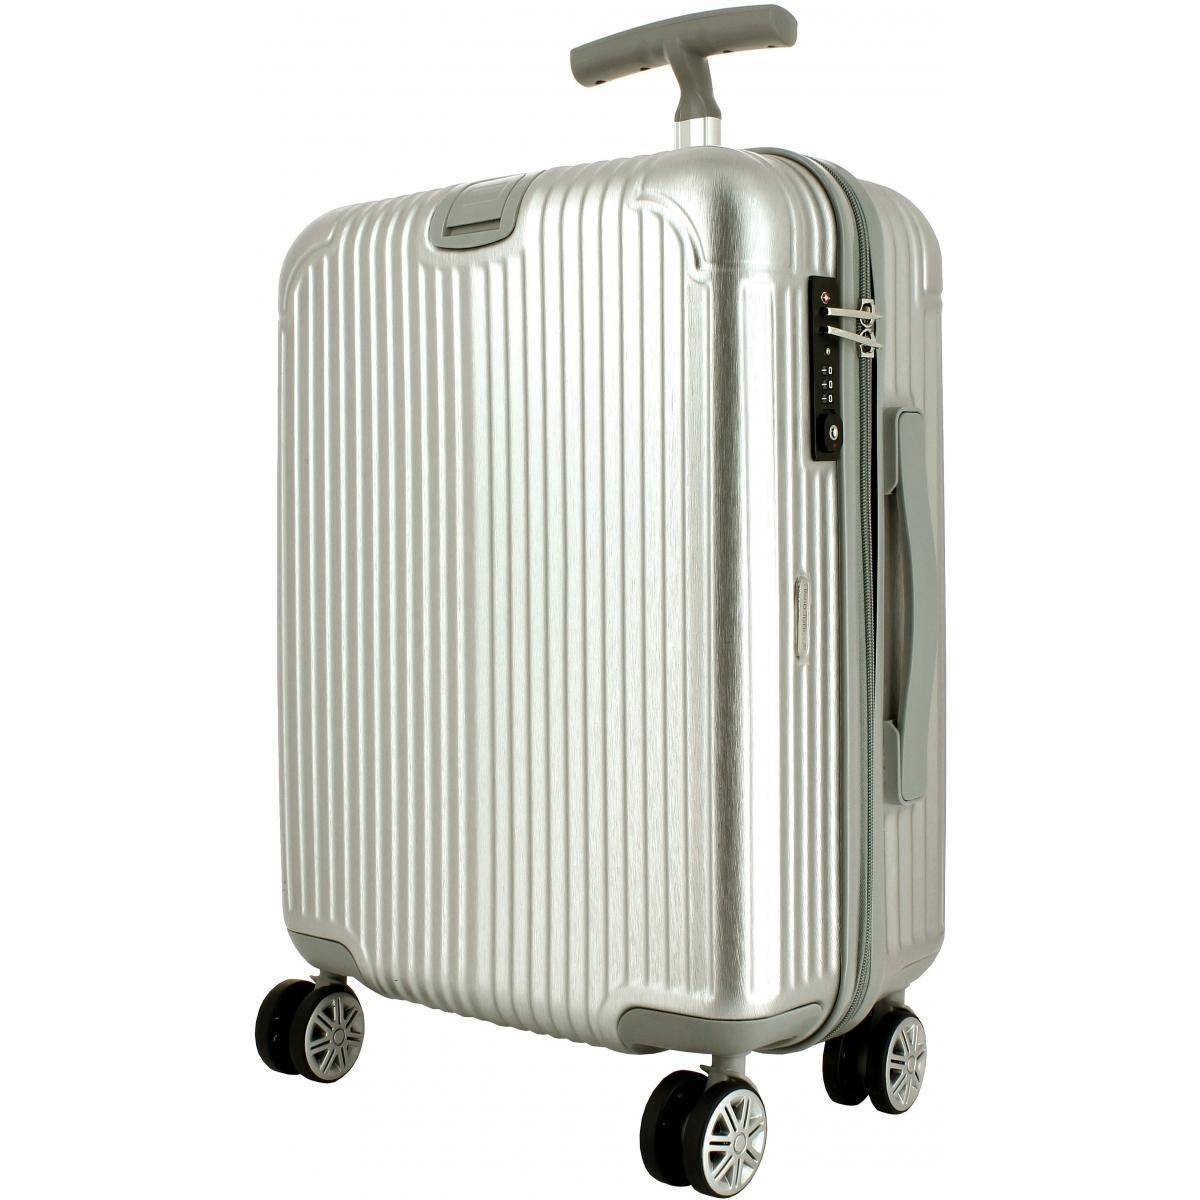 valise cabine rigide david jones tsa ba20631p couleur principale gris 11 promotion. Black Bedroom Furniture Sets. Home Design Ideas